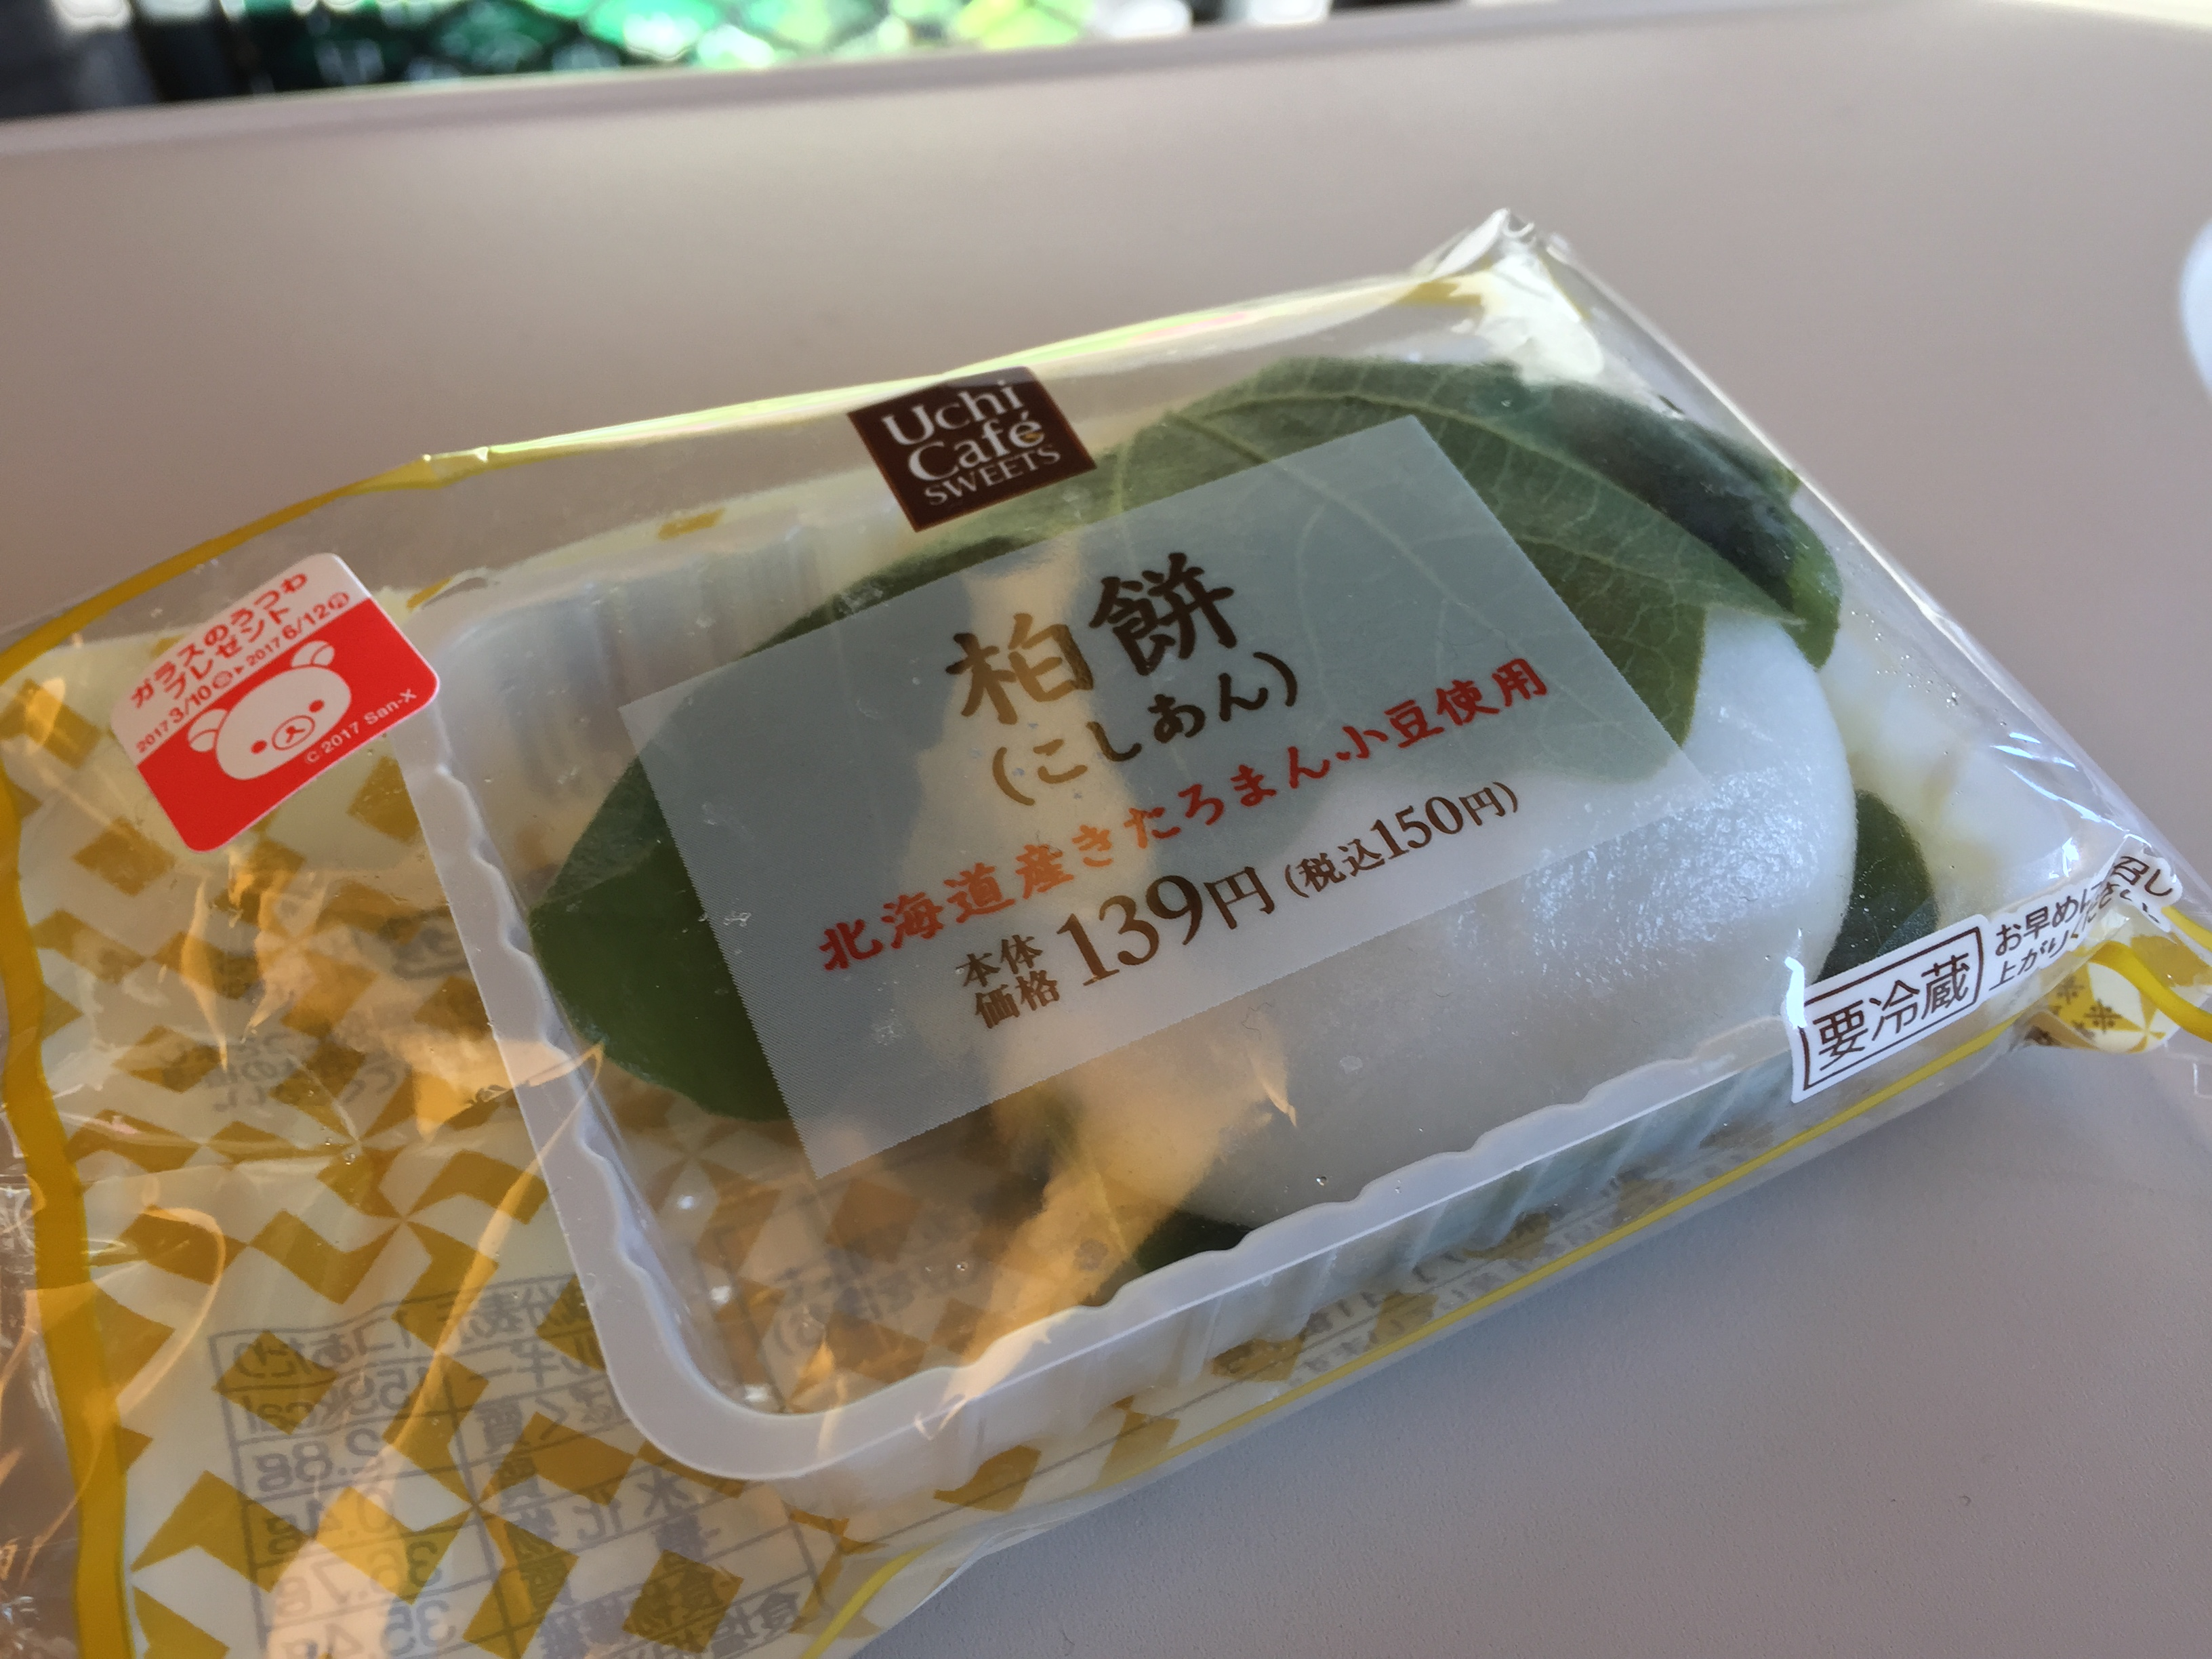 [Lawson] Uchi Cafe SWEETS 柏餅(카시..